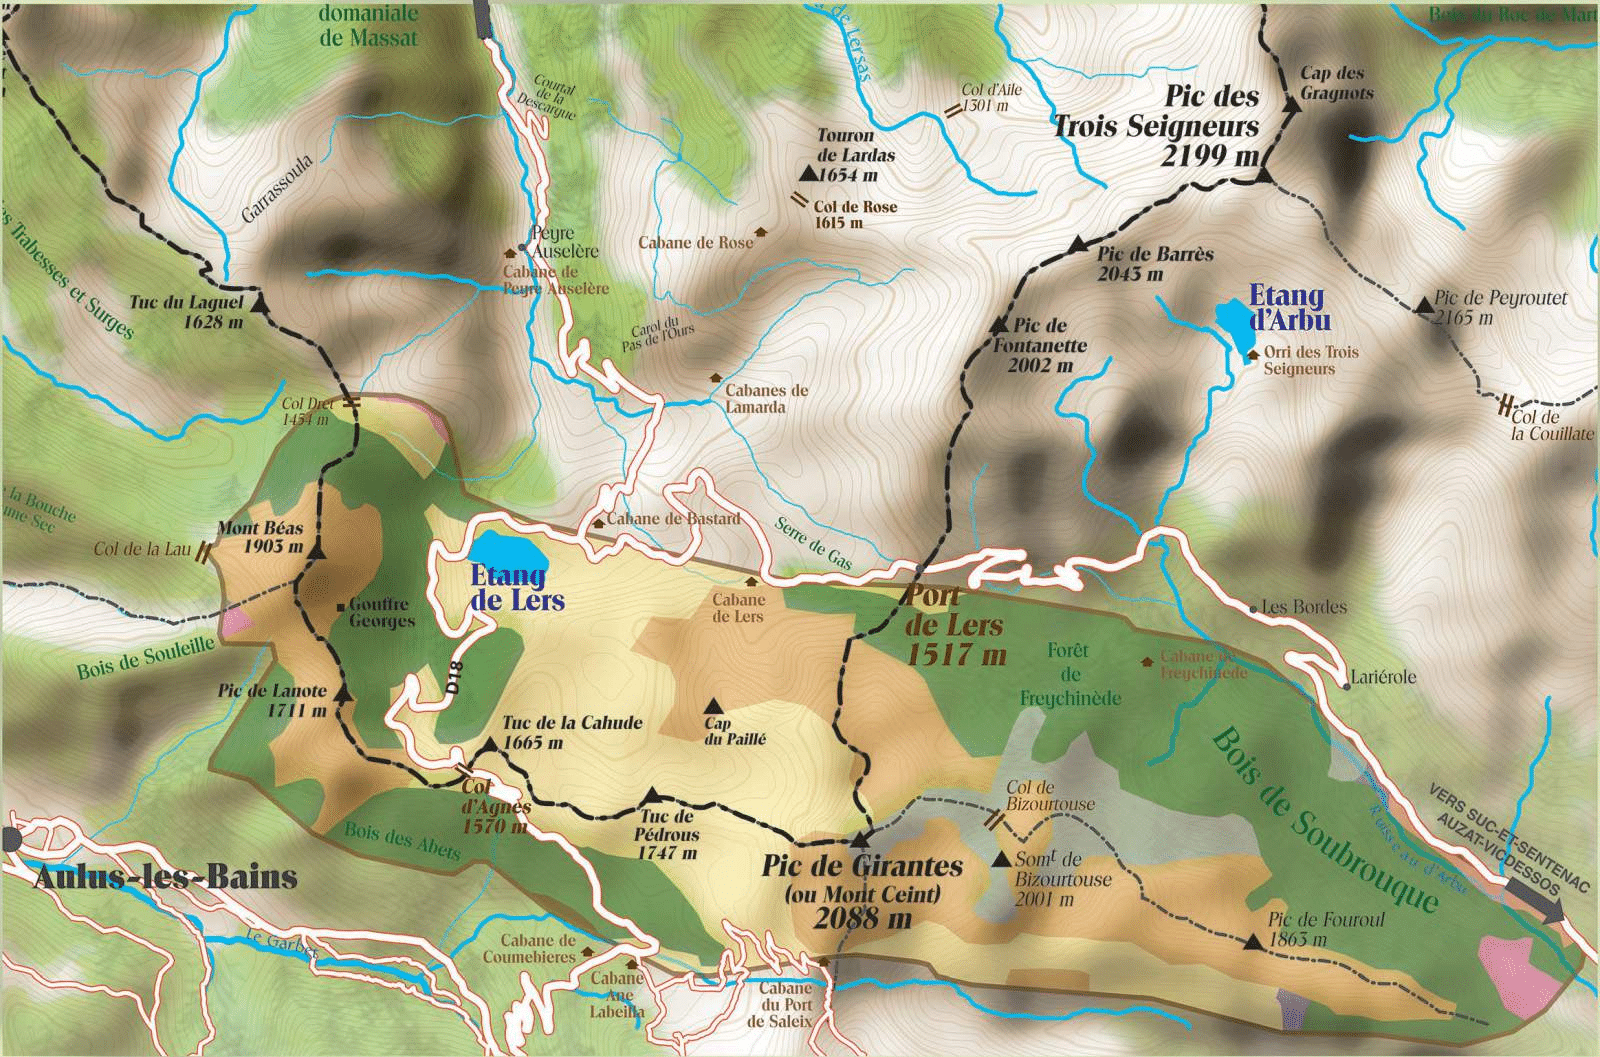 Plan de l'étang de Lers